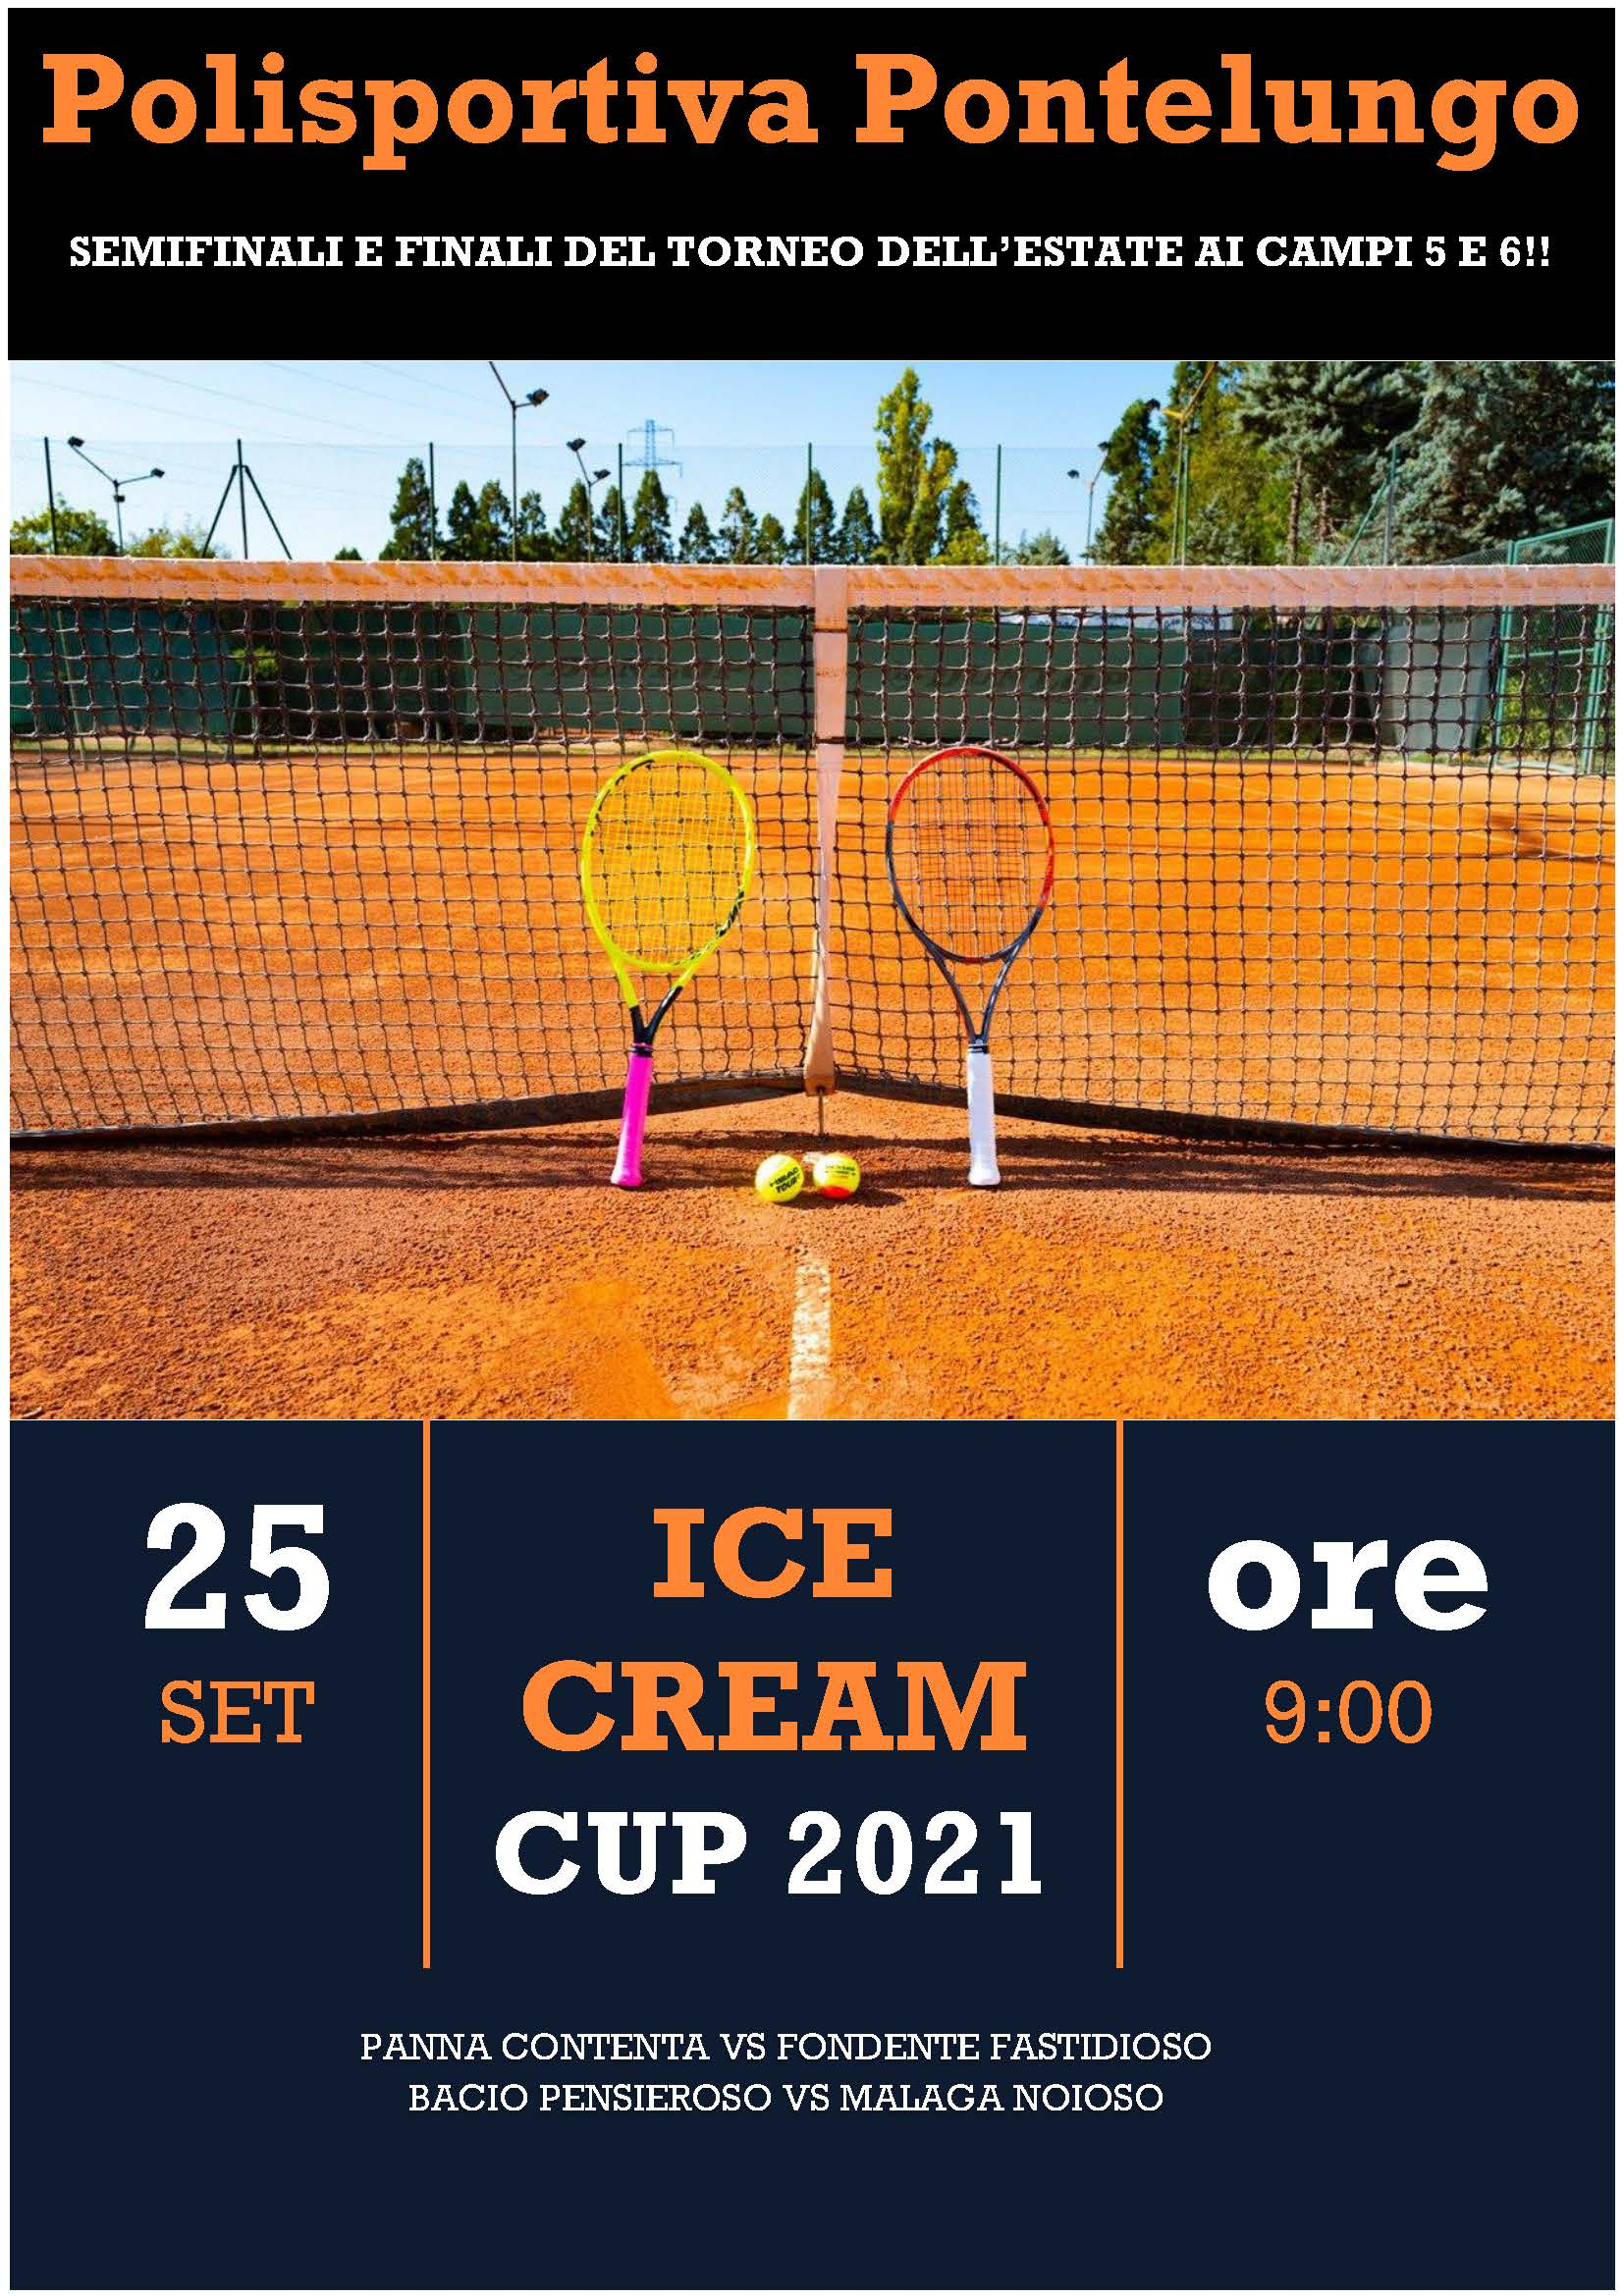 ICE CREAM CUP 2021